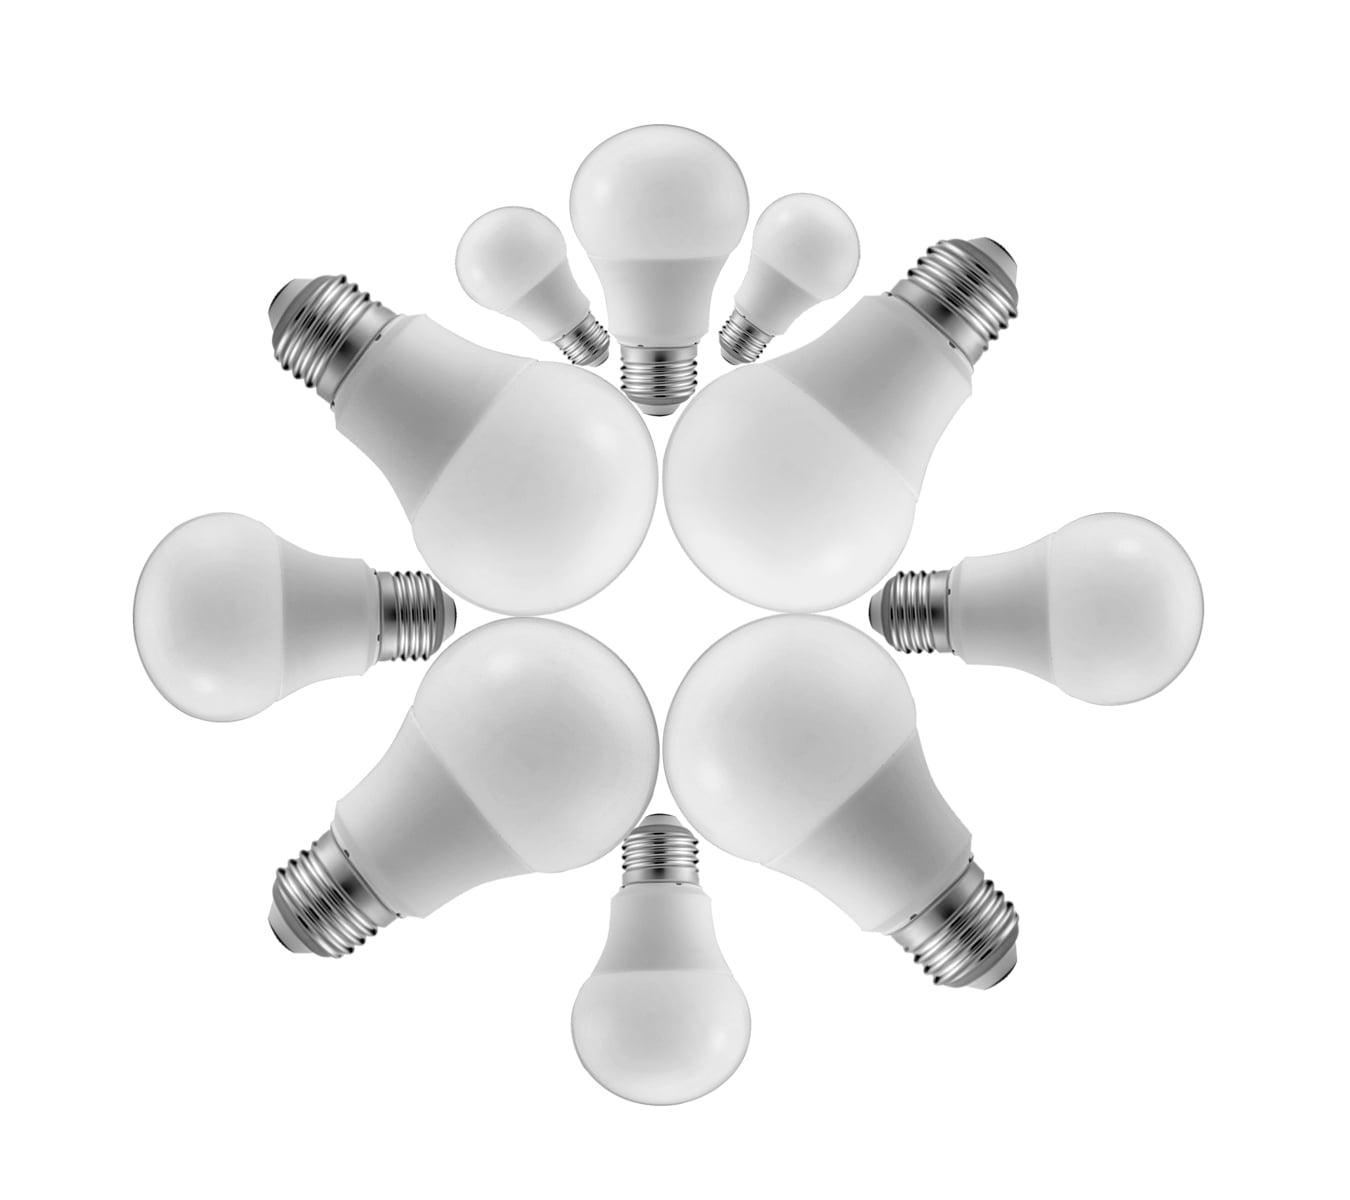 KIT COM 10 LAMPADA LED BULBO 7W BIVOLT E-27 CERTIFICADA INMETRO